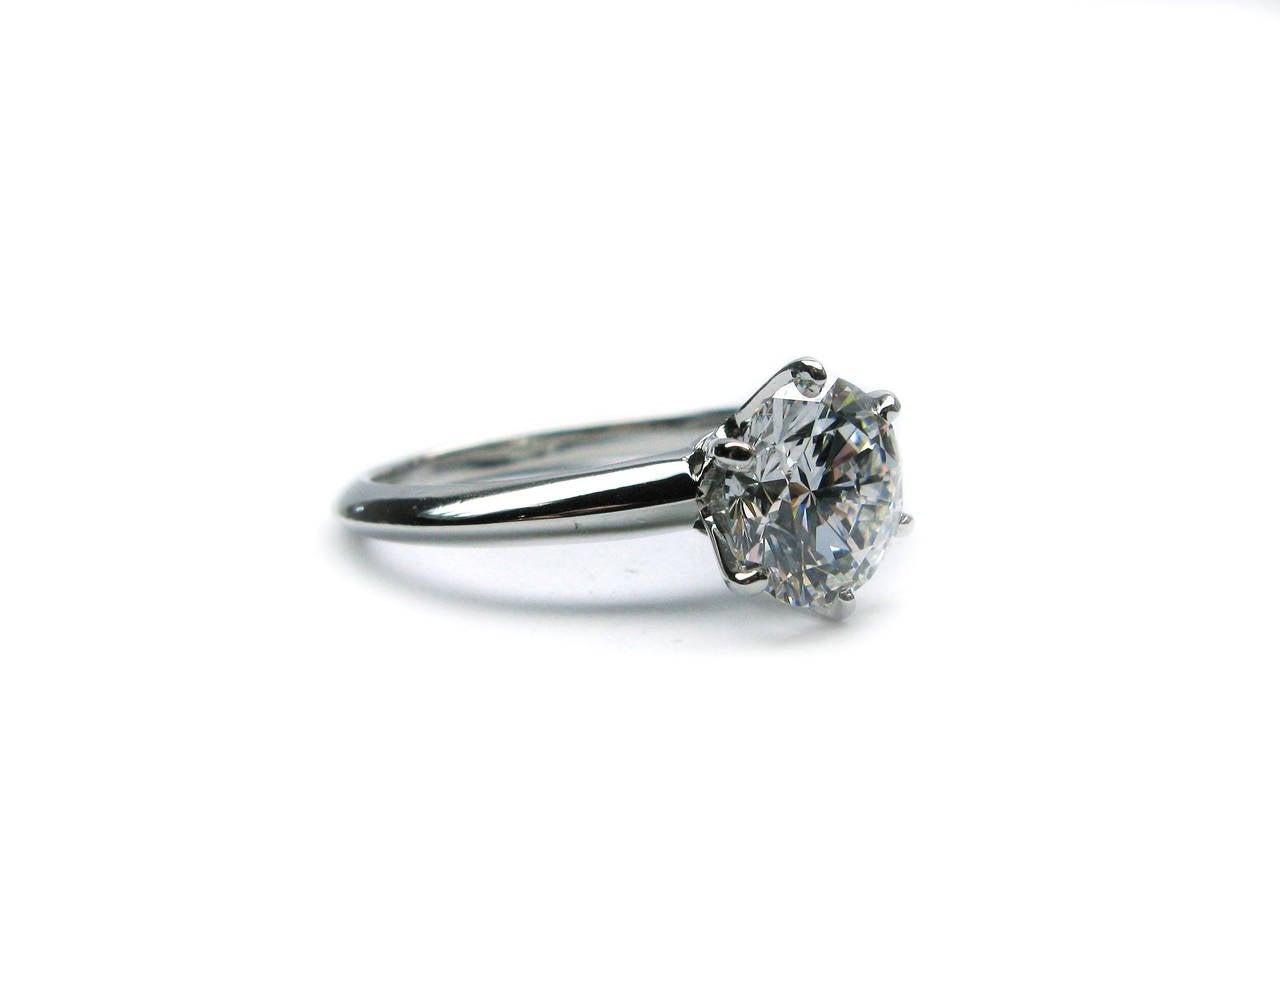 Tiffany and Co 2 03 Carat Round Brilliant Diamond Platinum Engagement Ring a